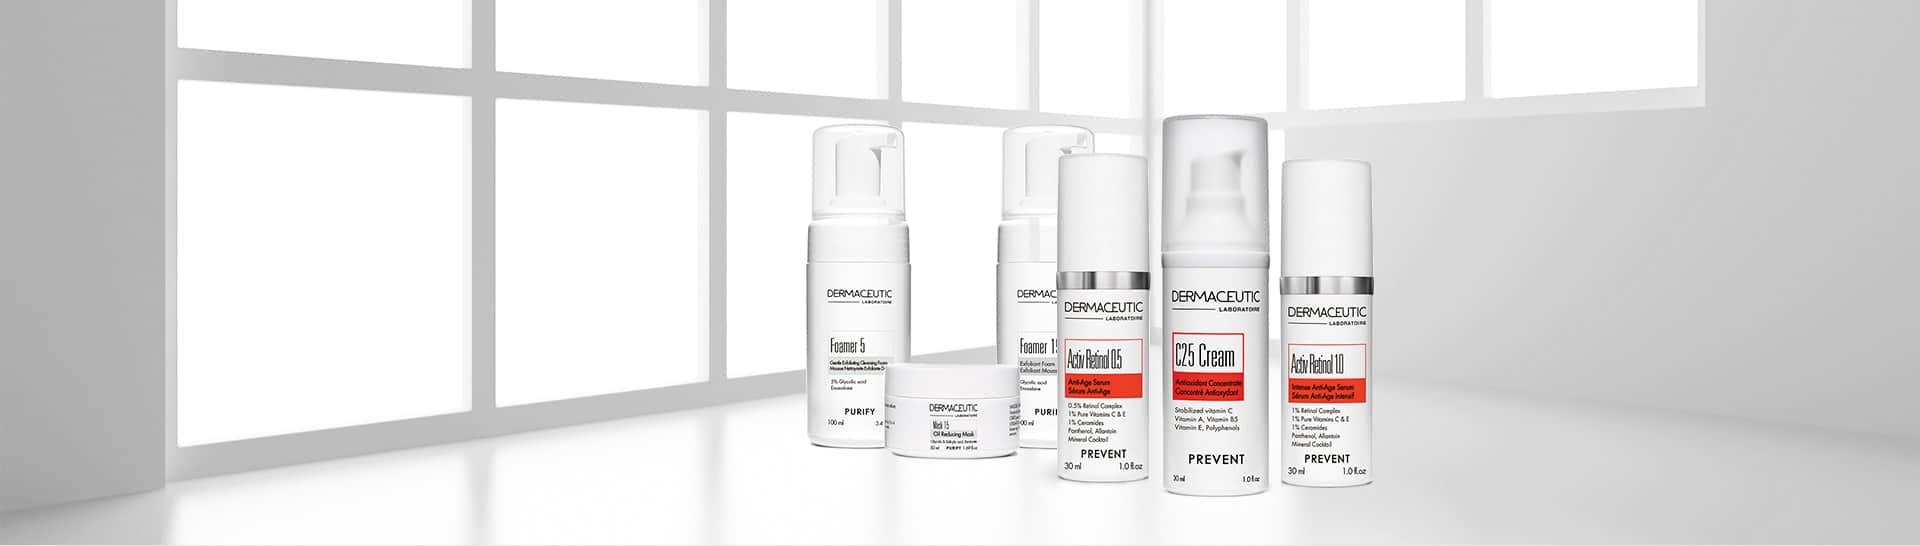 Dermaceutic España | Dermaceutic aterriza en España